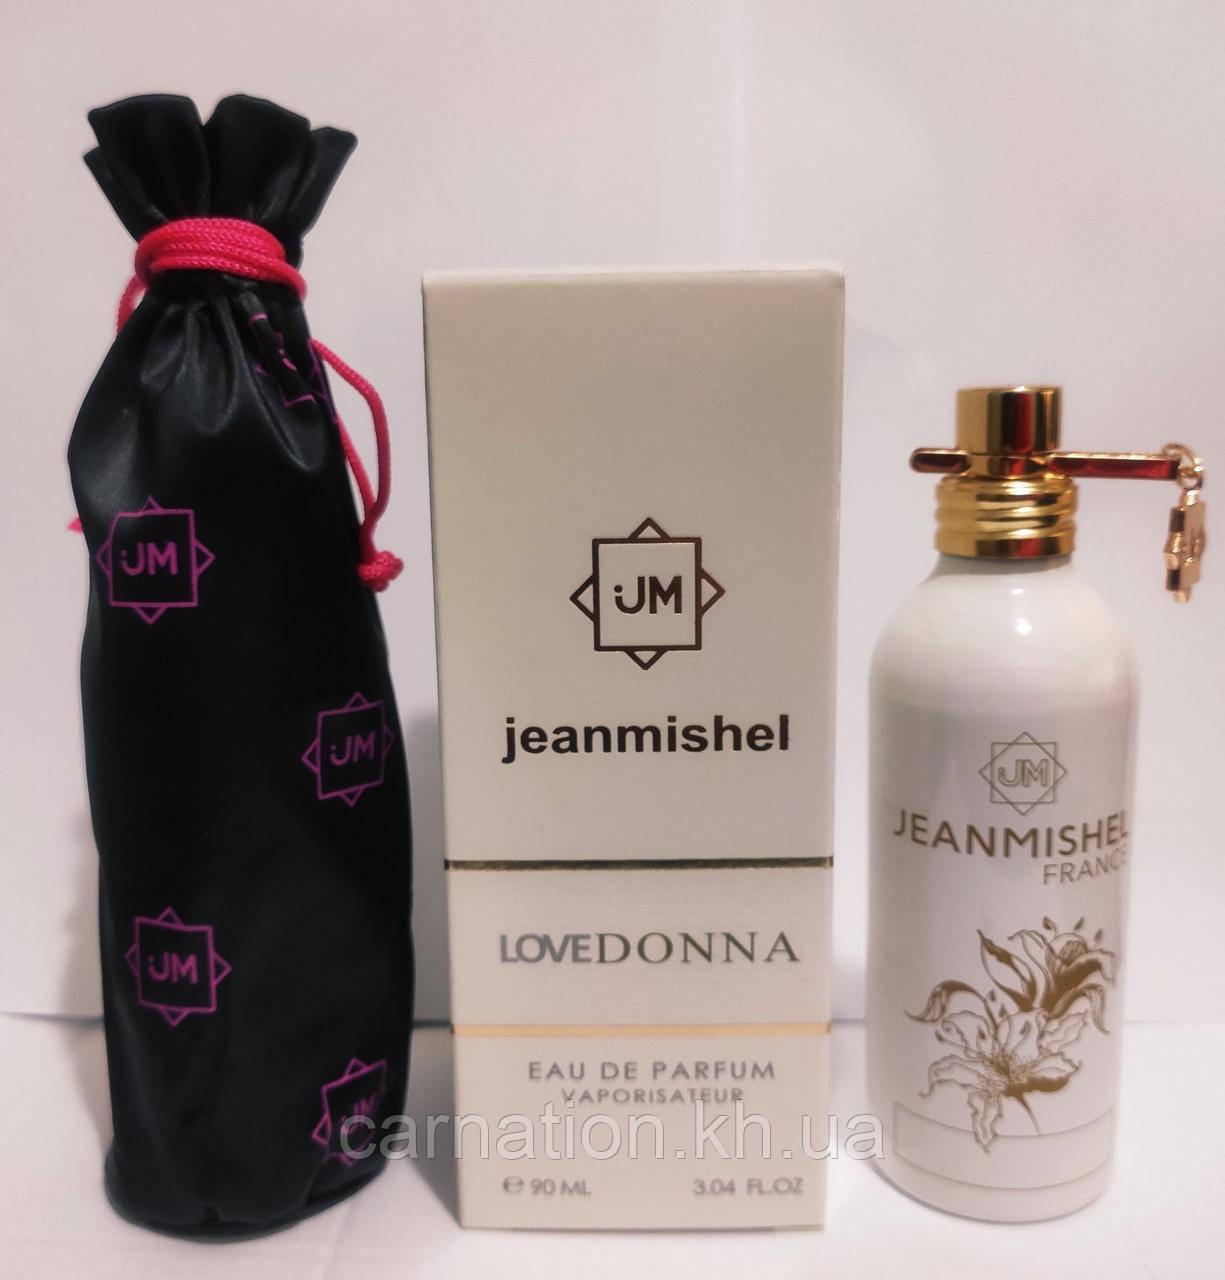 Жіноча парфумована вода Jeanmishel LoveDonna 90 мл